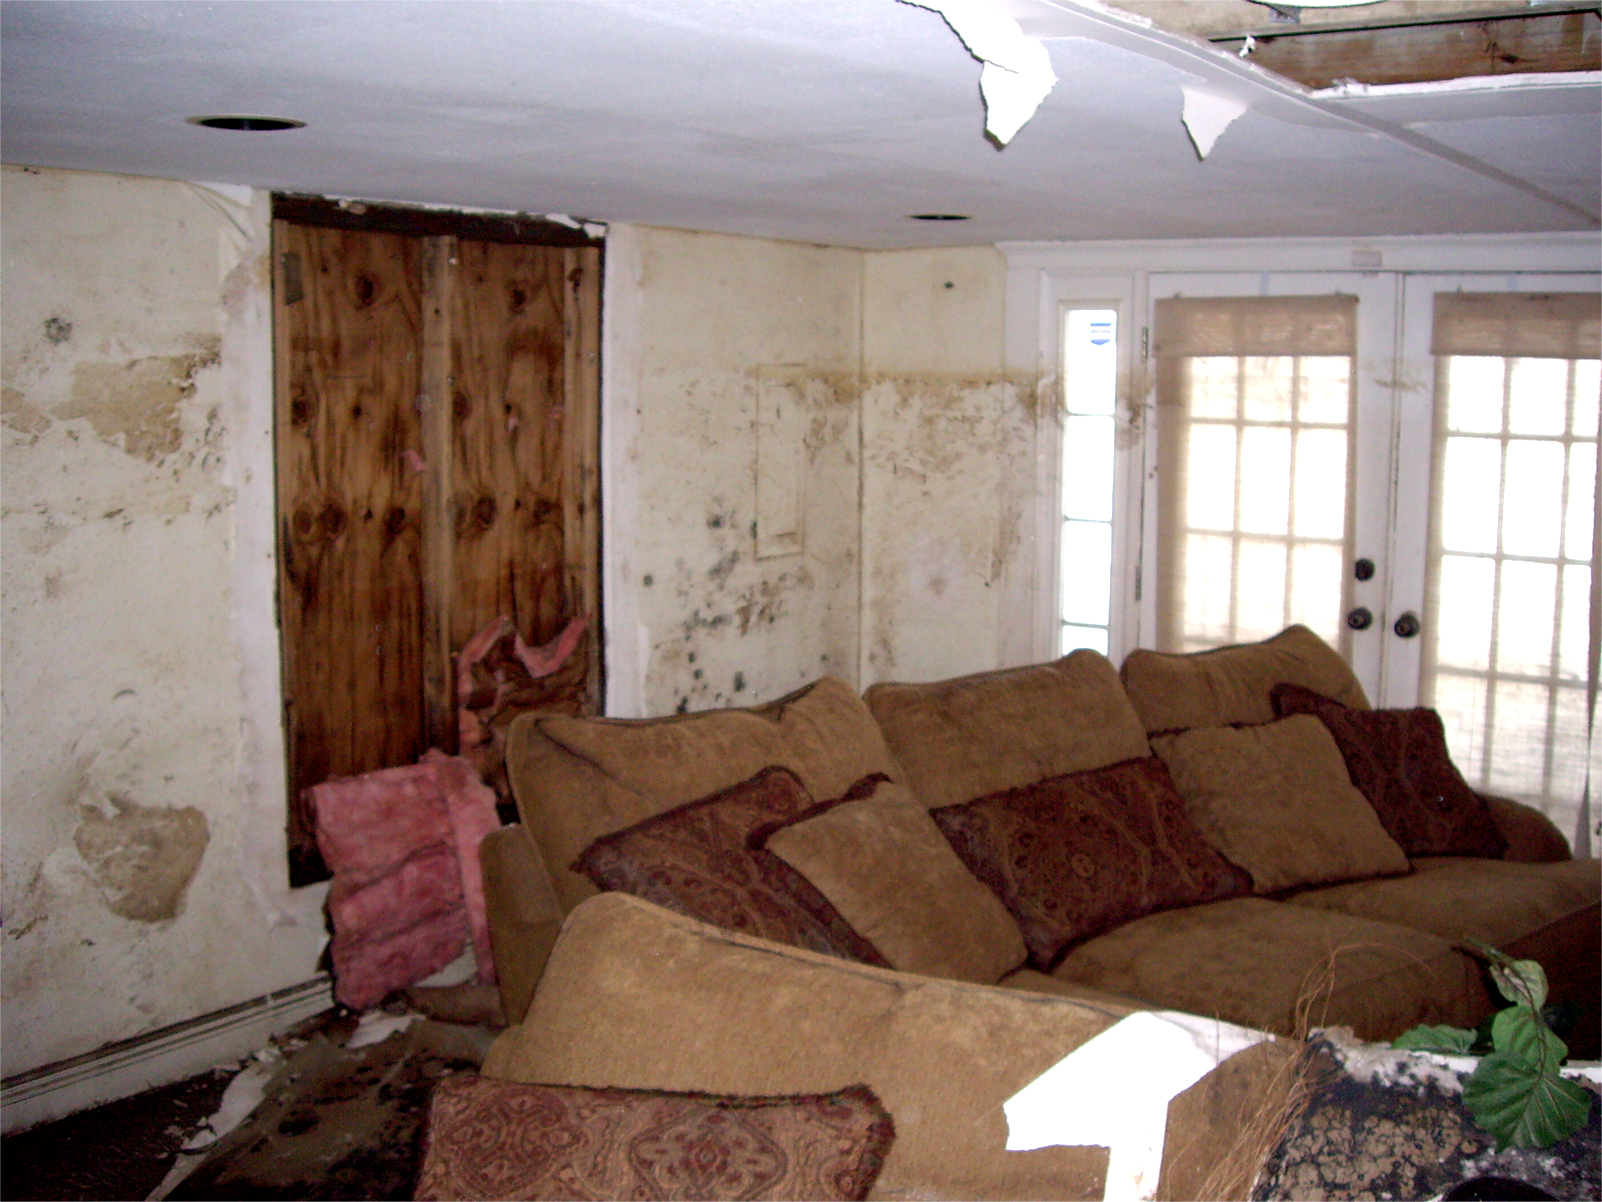 schimmel k che schimmelbefall hinter wandverbauten. Black Bedroom Furniture Sets. Home Design Ideas